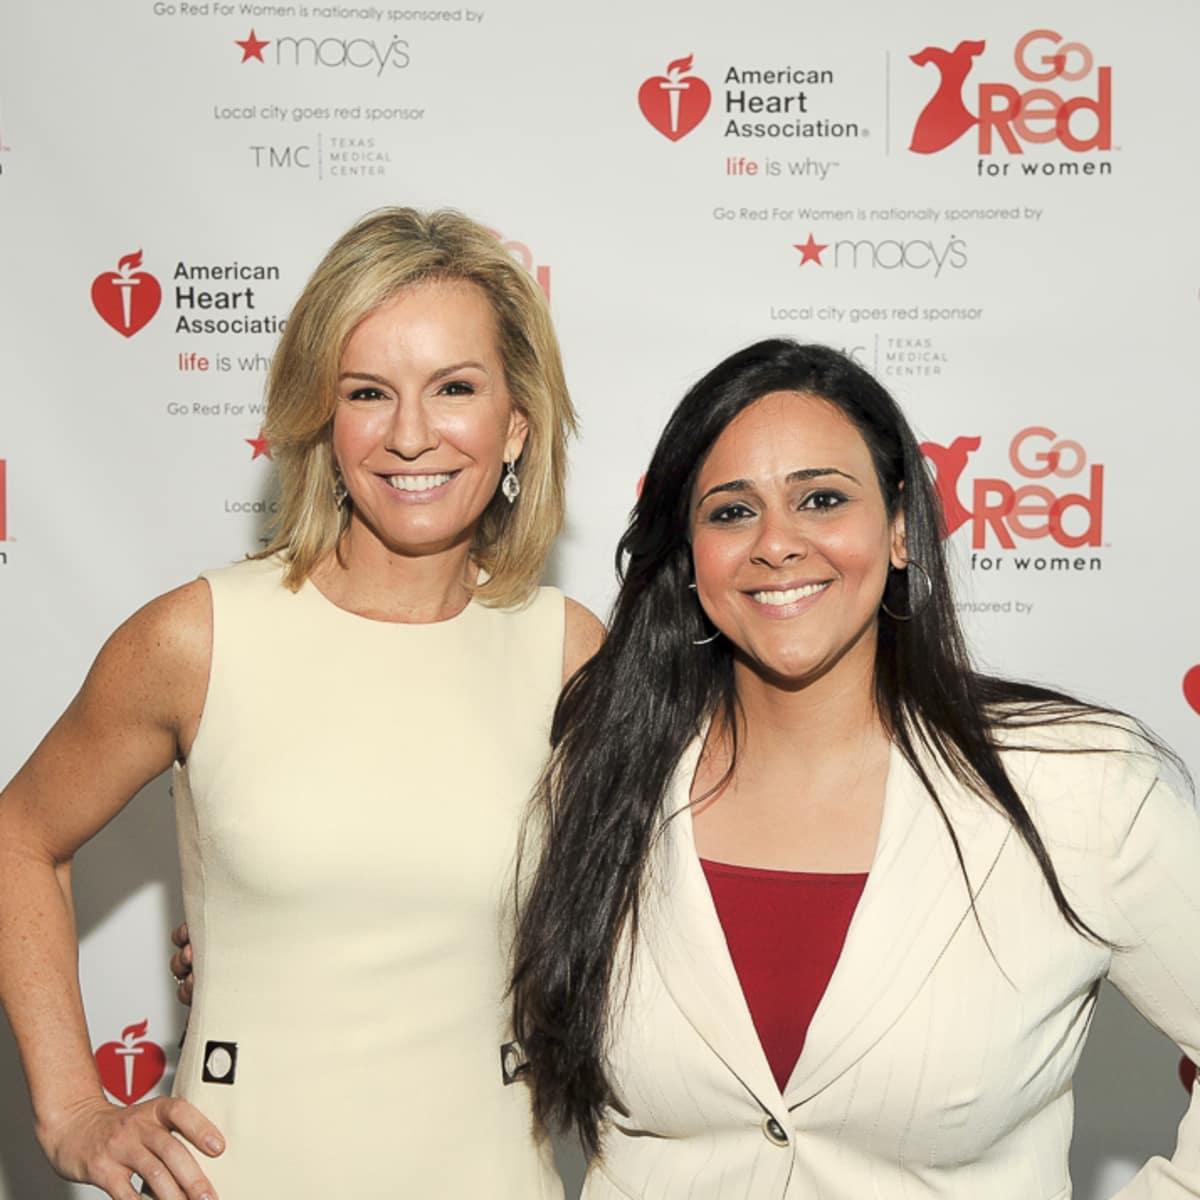 Go Red for Women, 5/16, Dr. Jennifer Ashton, Yara El-Sayed